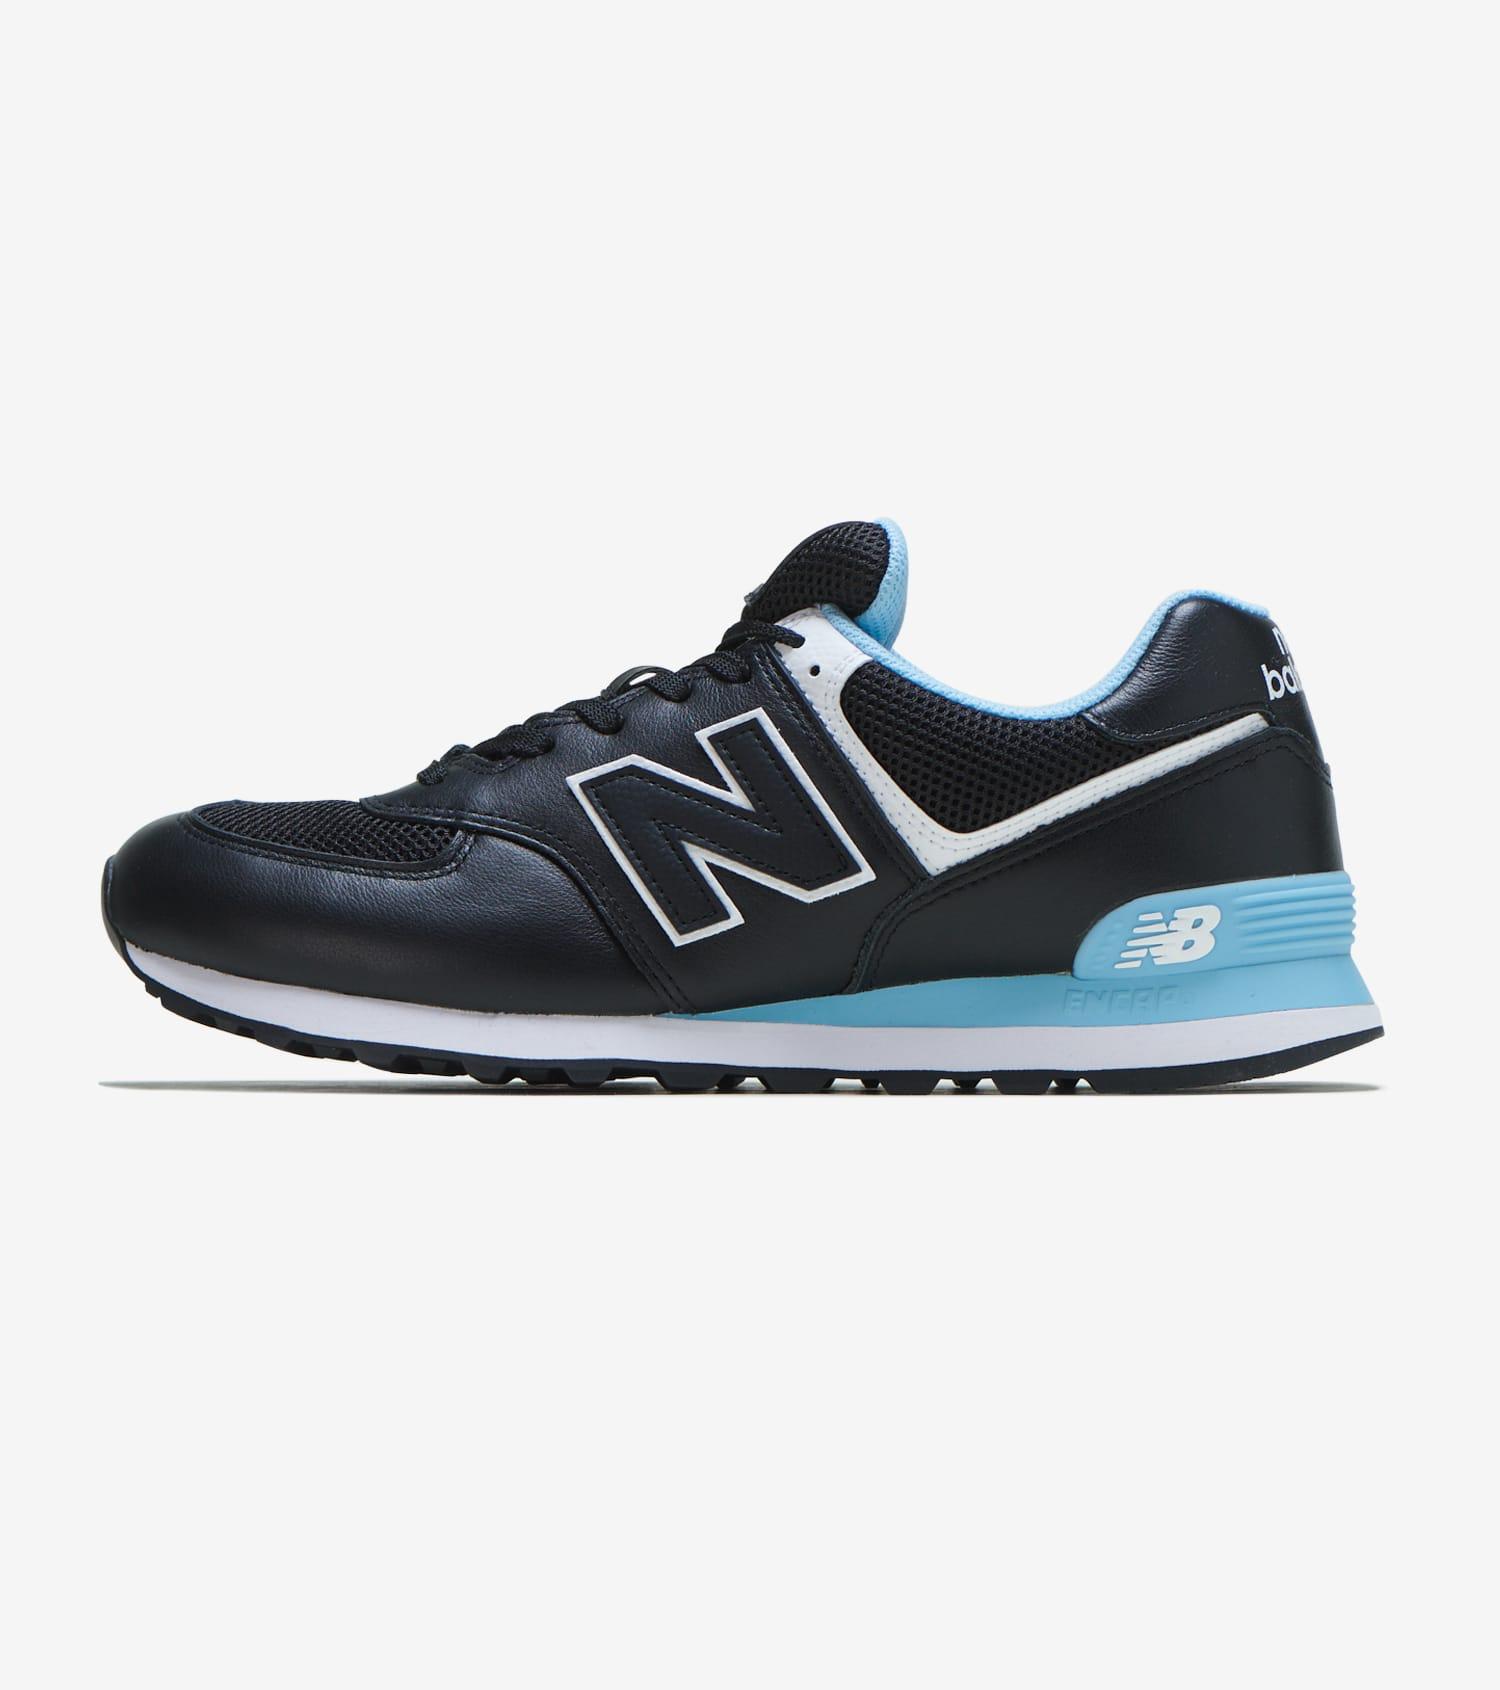 billige new balance sneakers, New Balance KL574 Sneakers